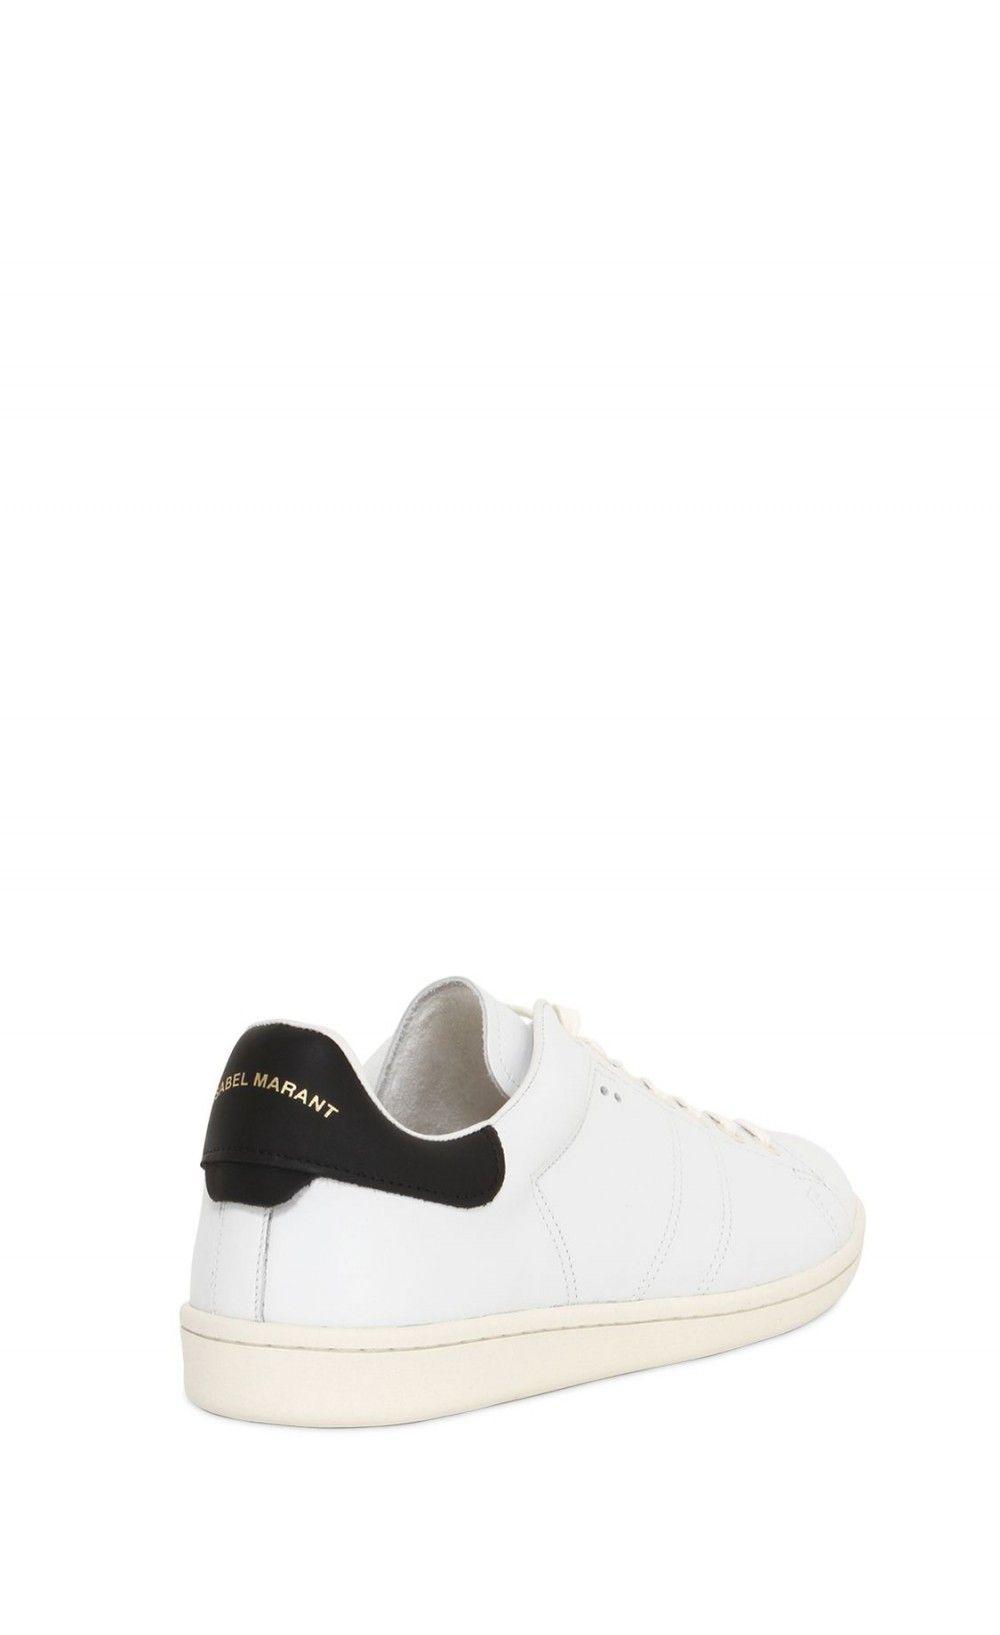 550d1d443d Isabel Marant Etoile Bart Leather Sneakers Black - Isabel Marant ...